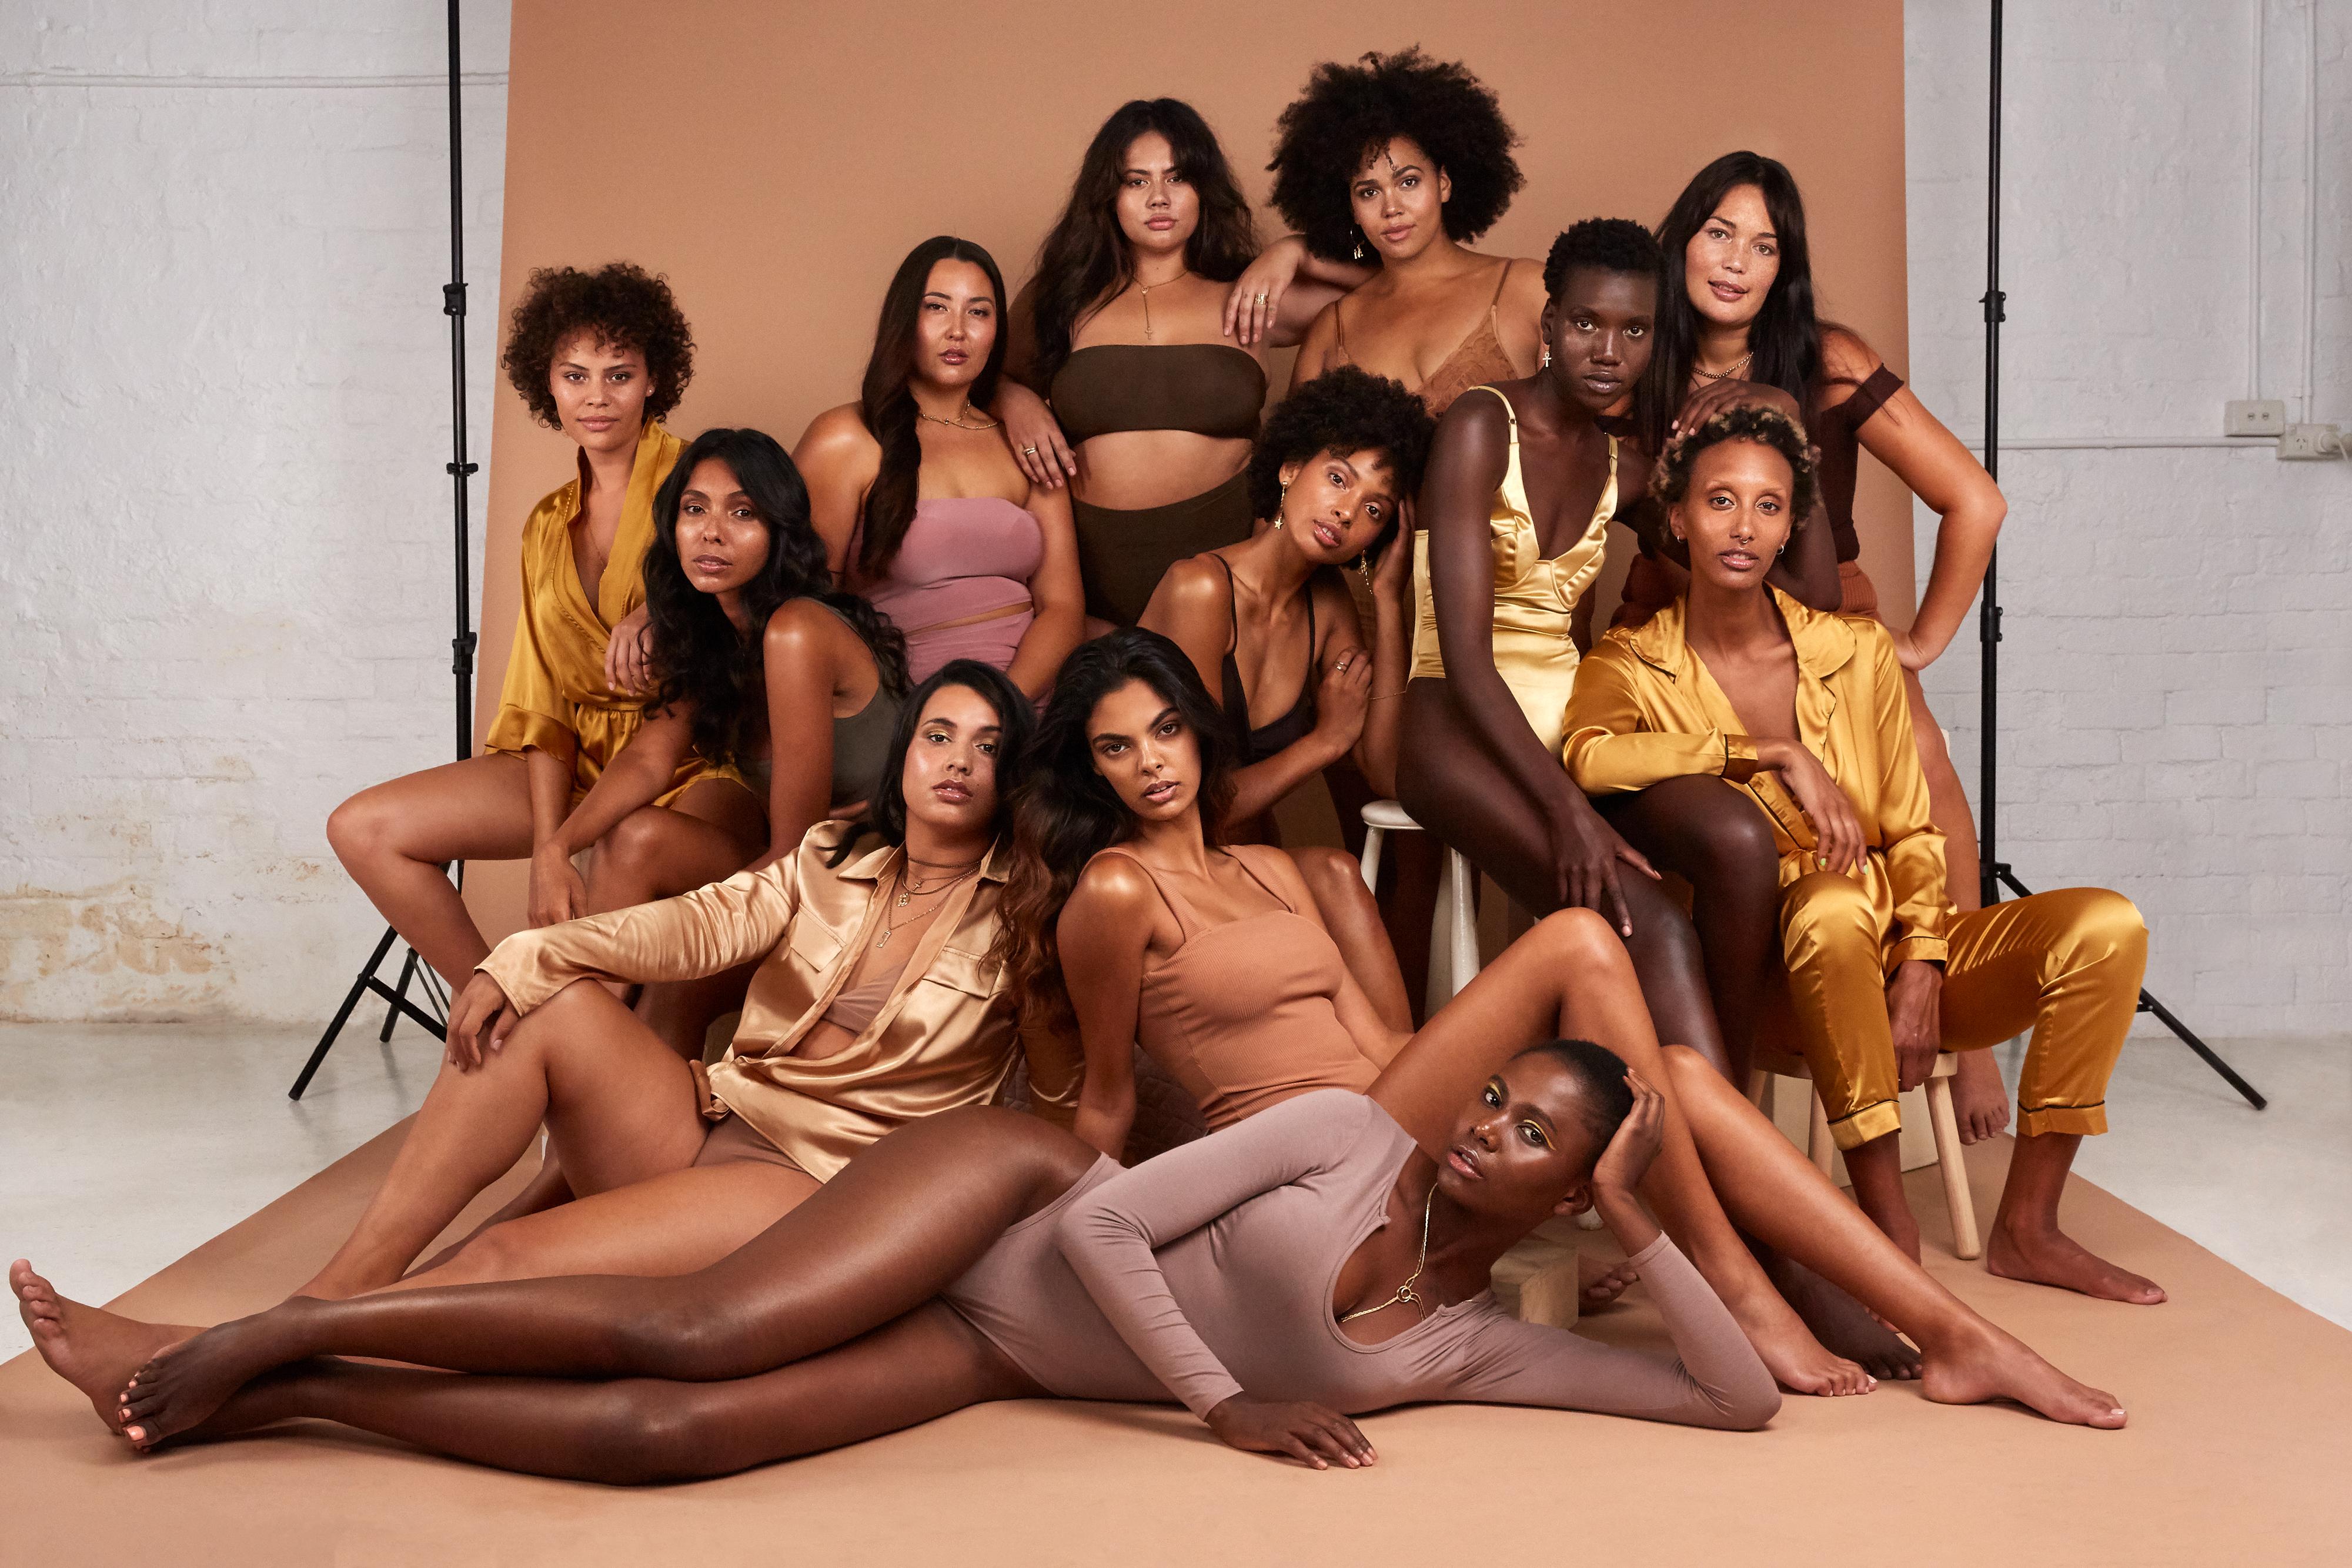 Mahalia Handley female curve model photoshoot for #shine4diversity Bridge Models London